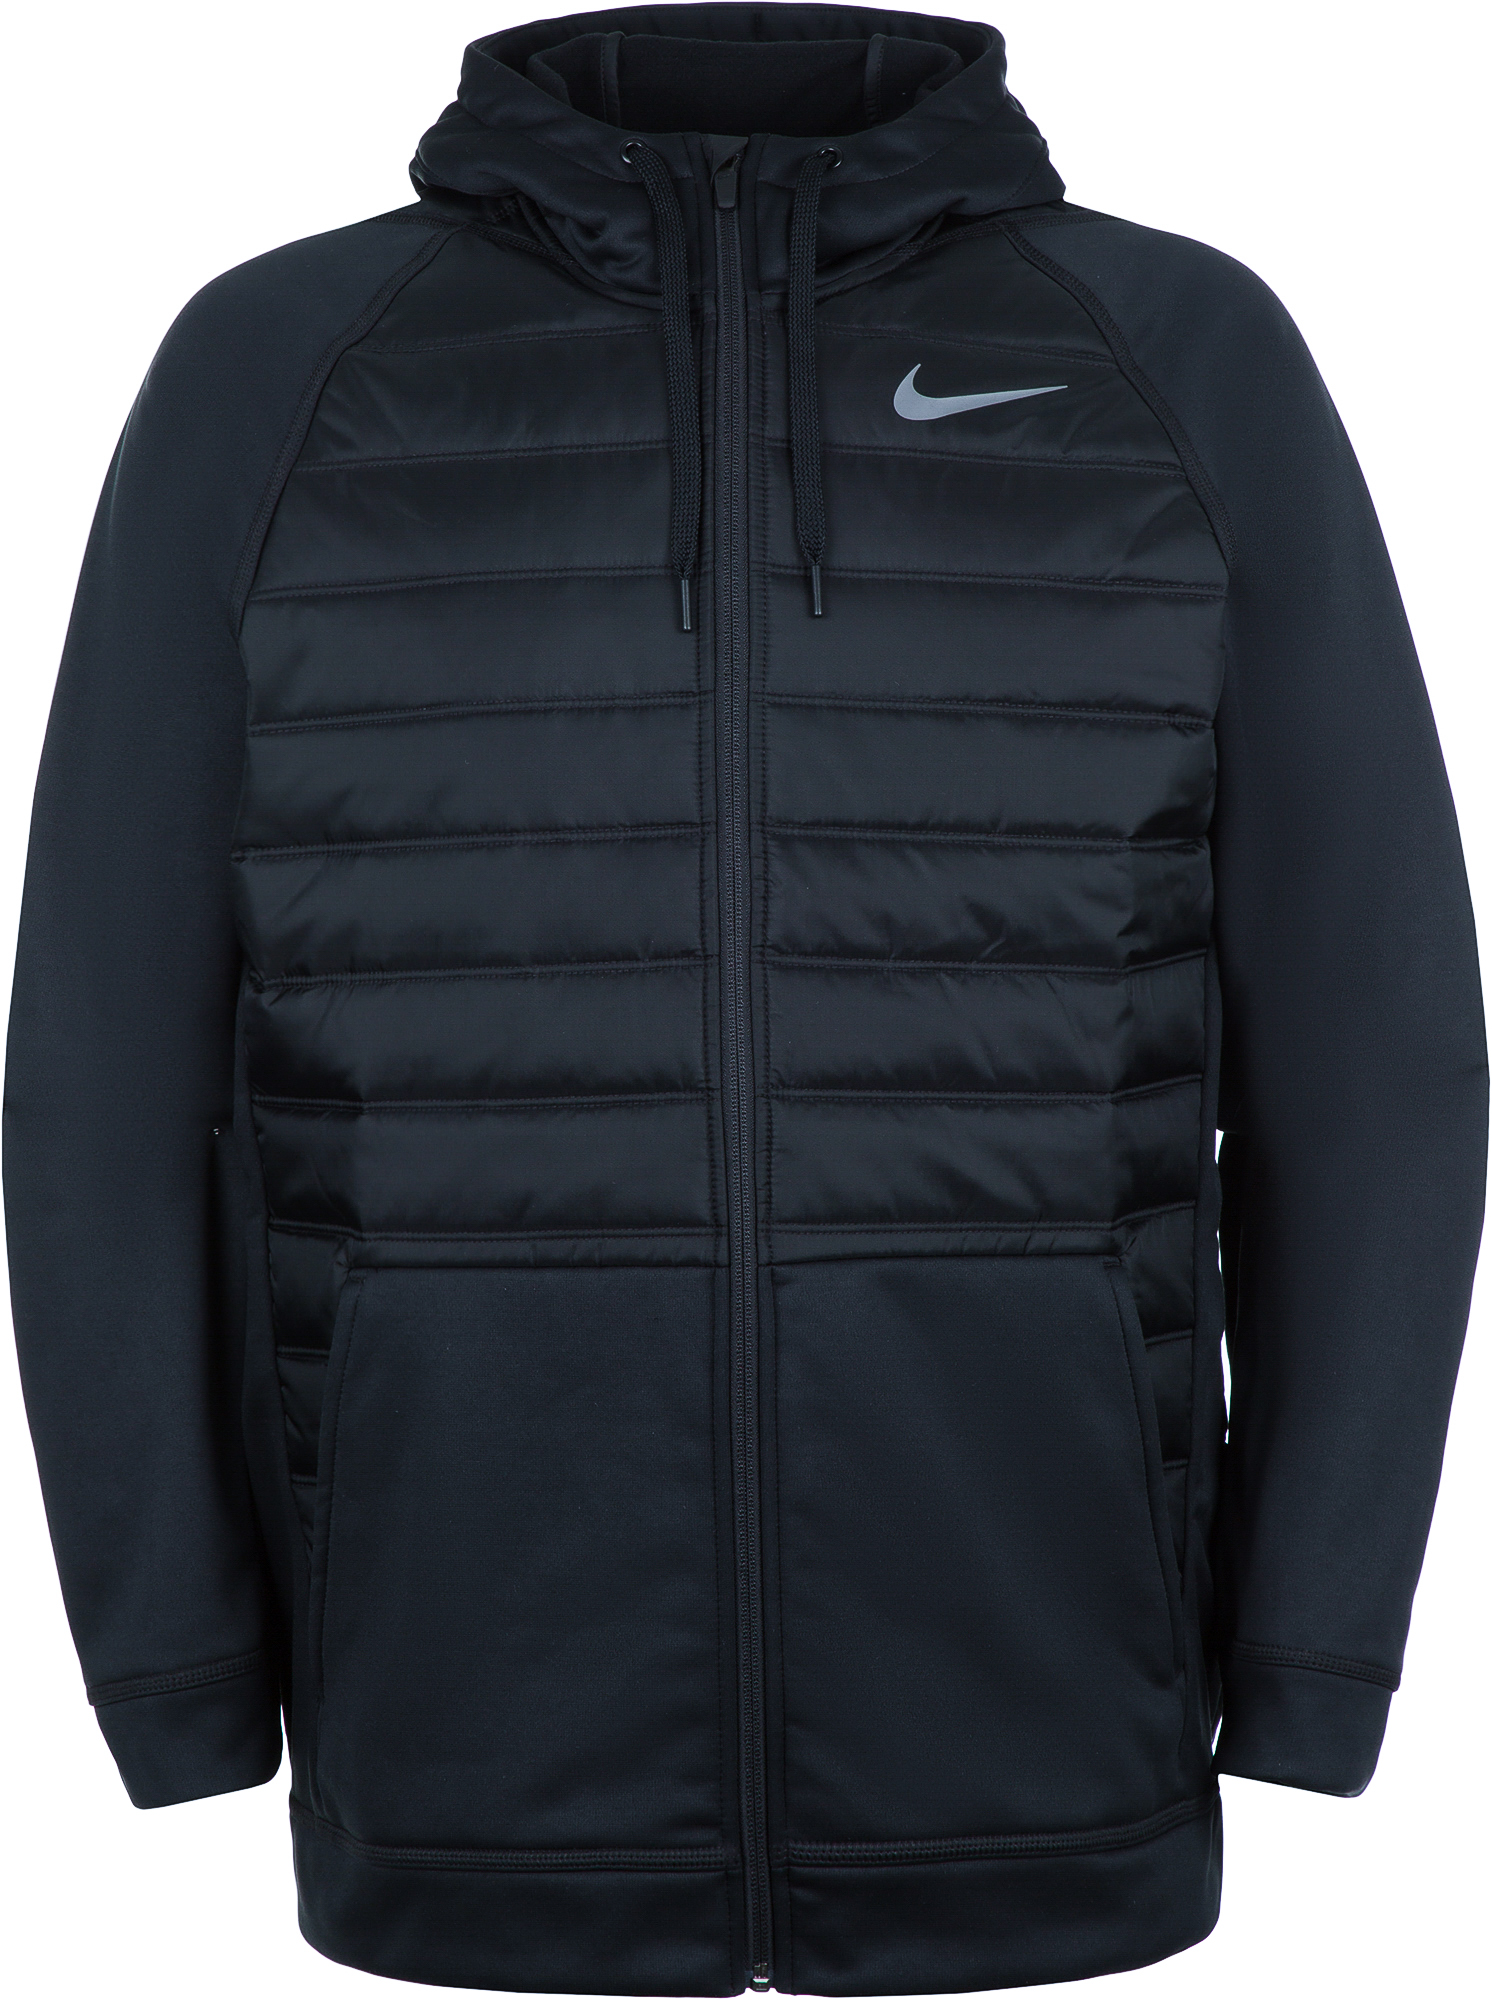 Nike Толстовка мужская Nike Therma, размер 44-46 nike джемпер для девочек nike therma